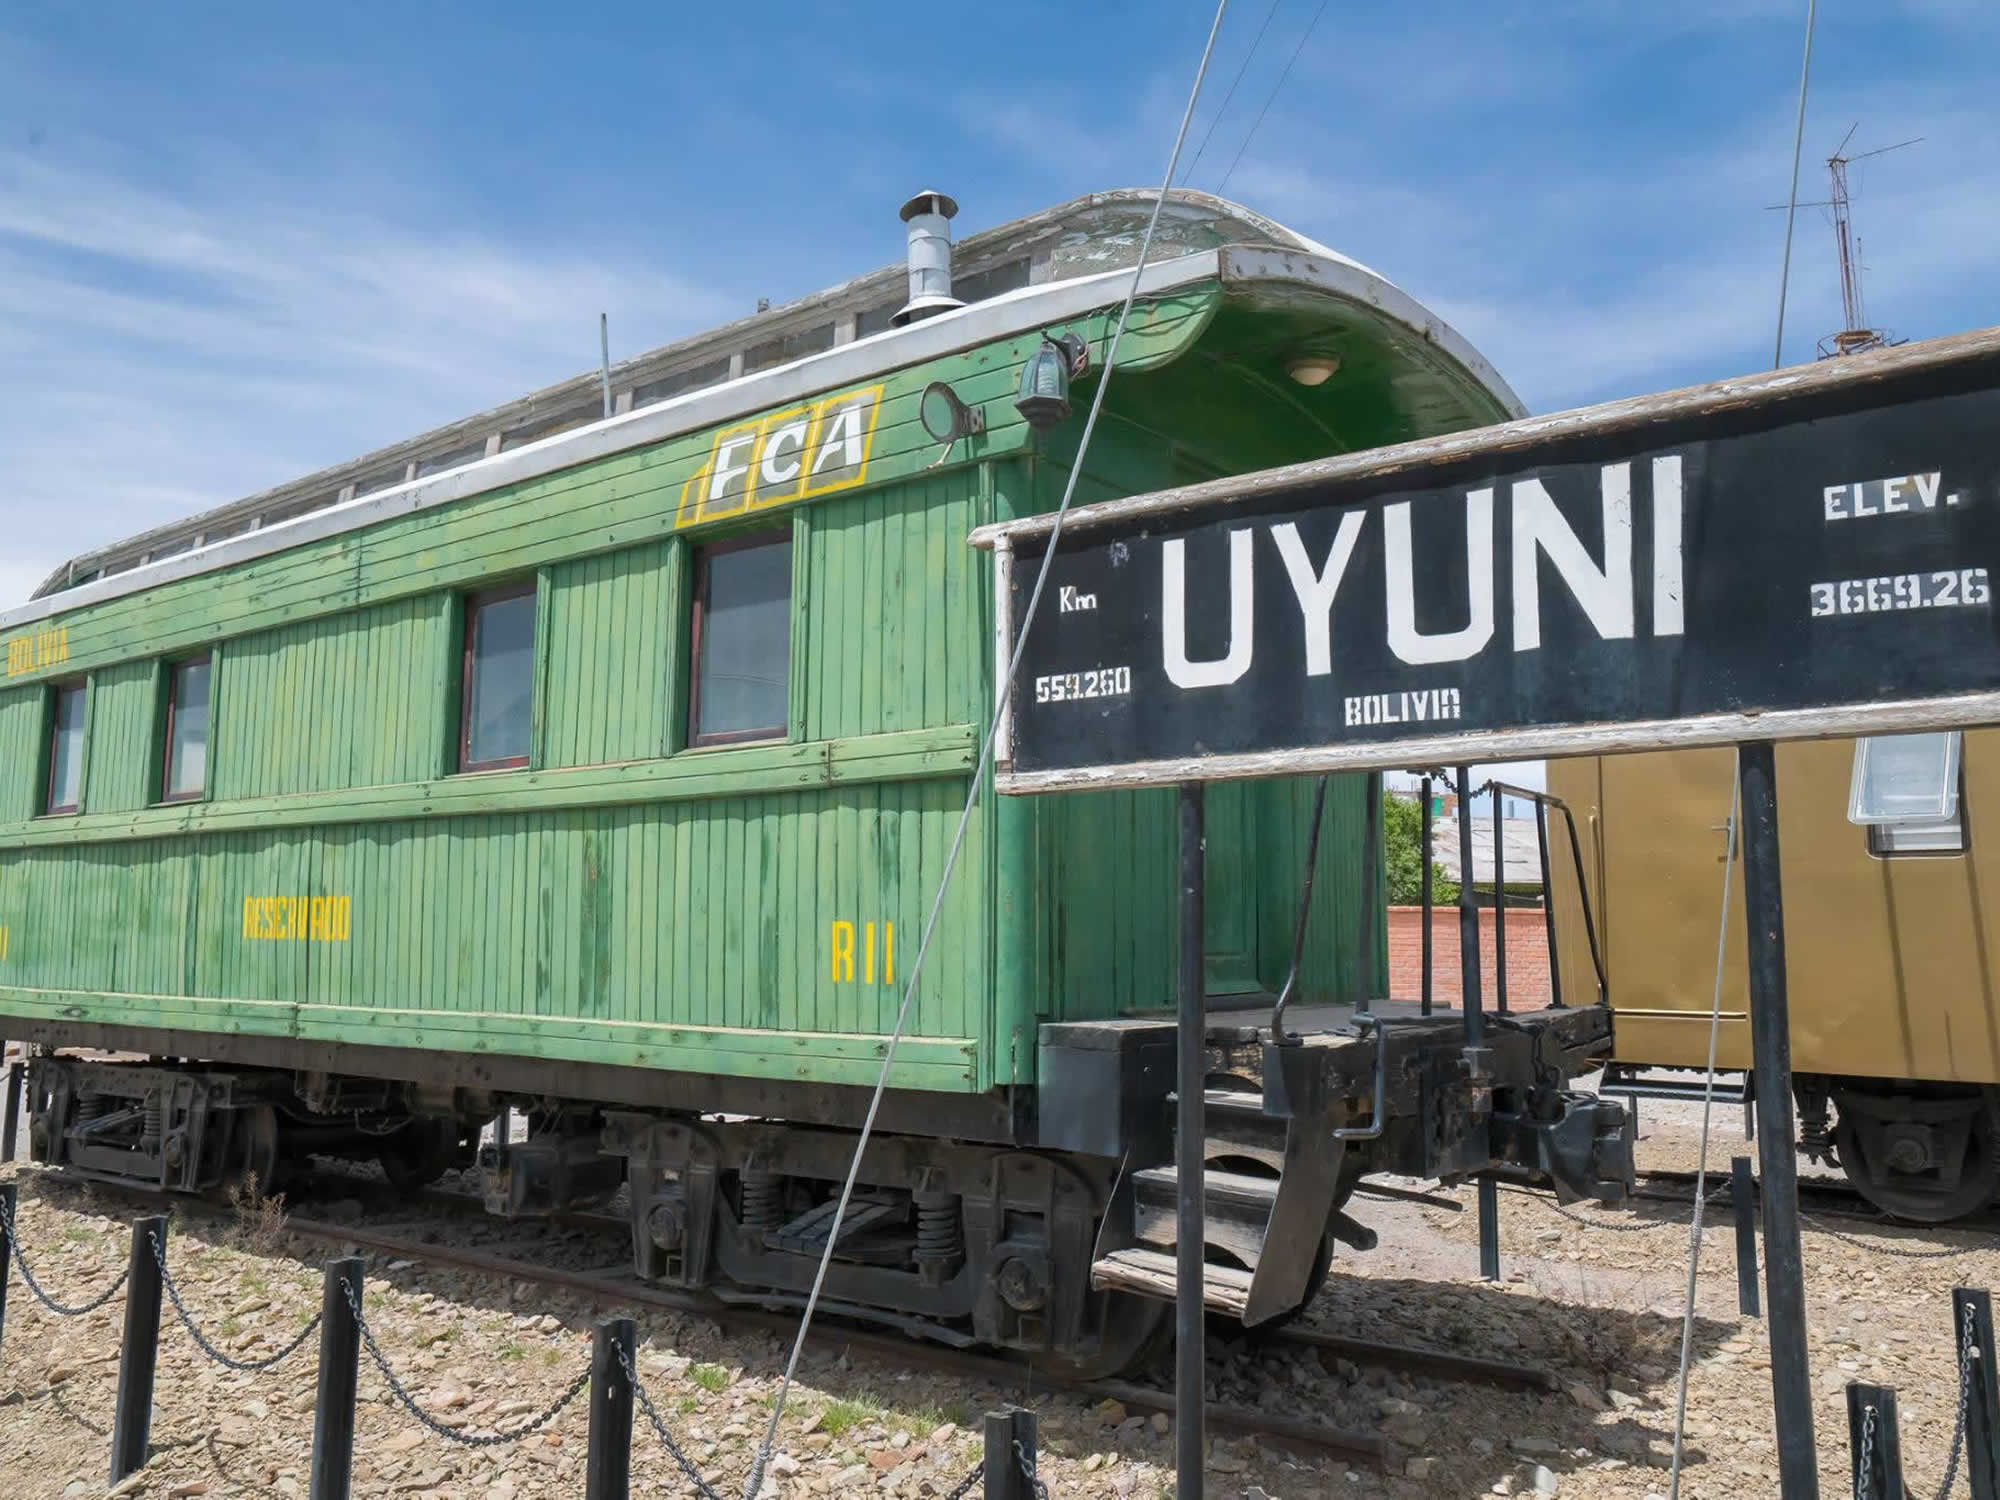 Tour Privado Calama - Salar de Uyuni, Uyuni